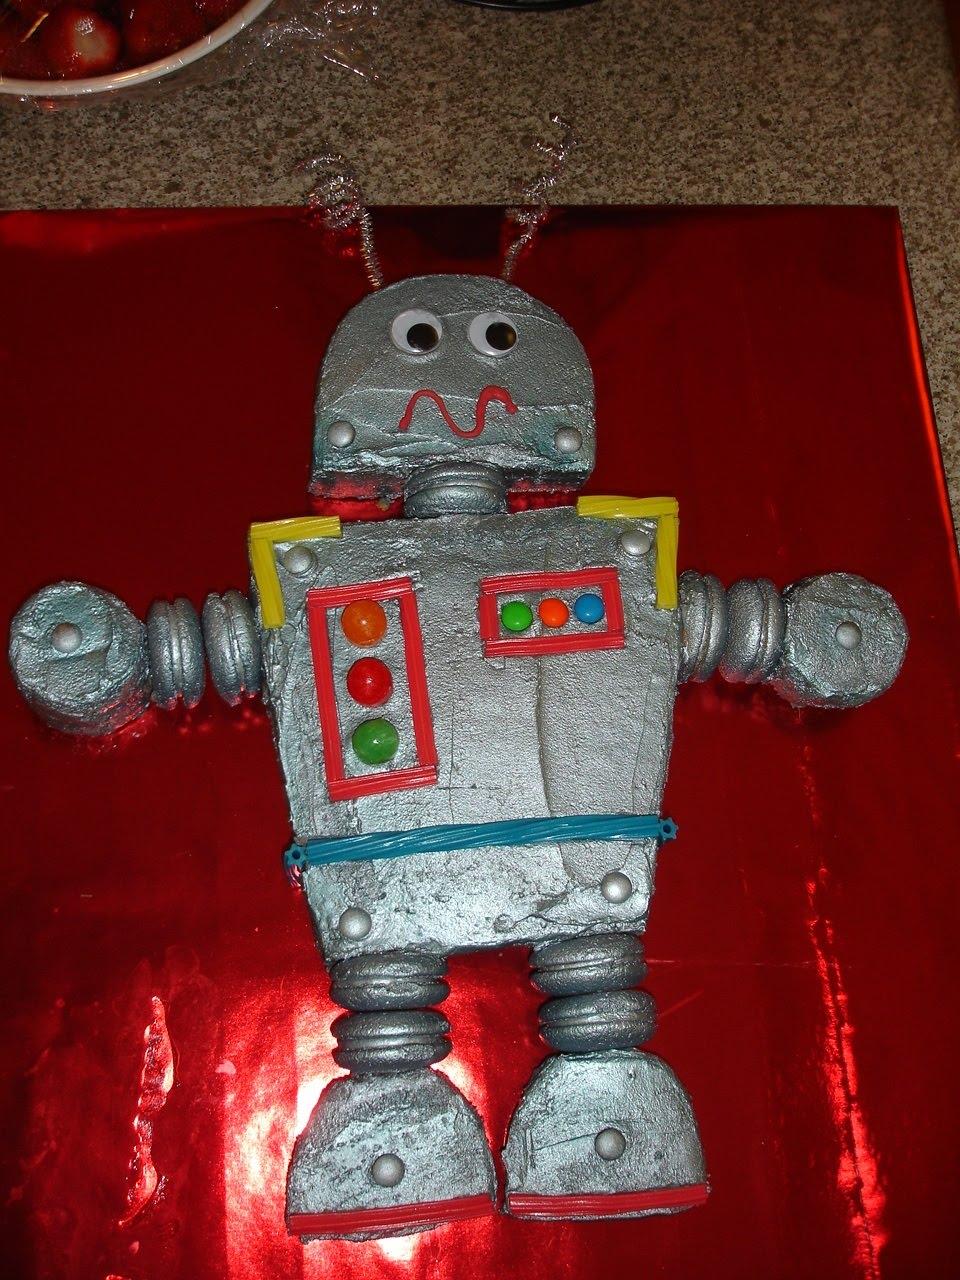 The Sugar Shack Robot Cake